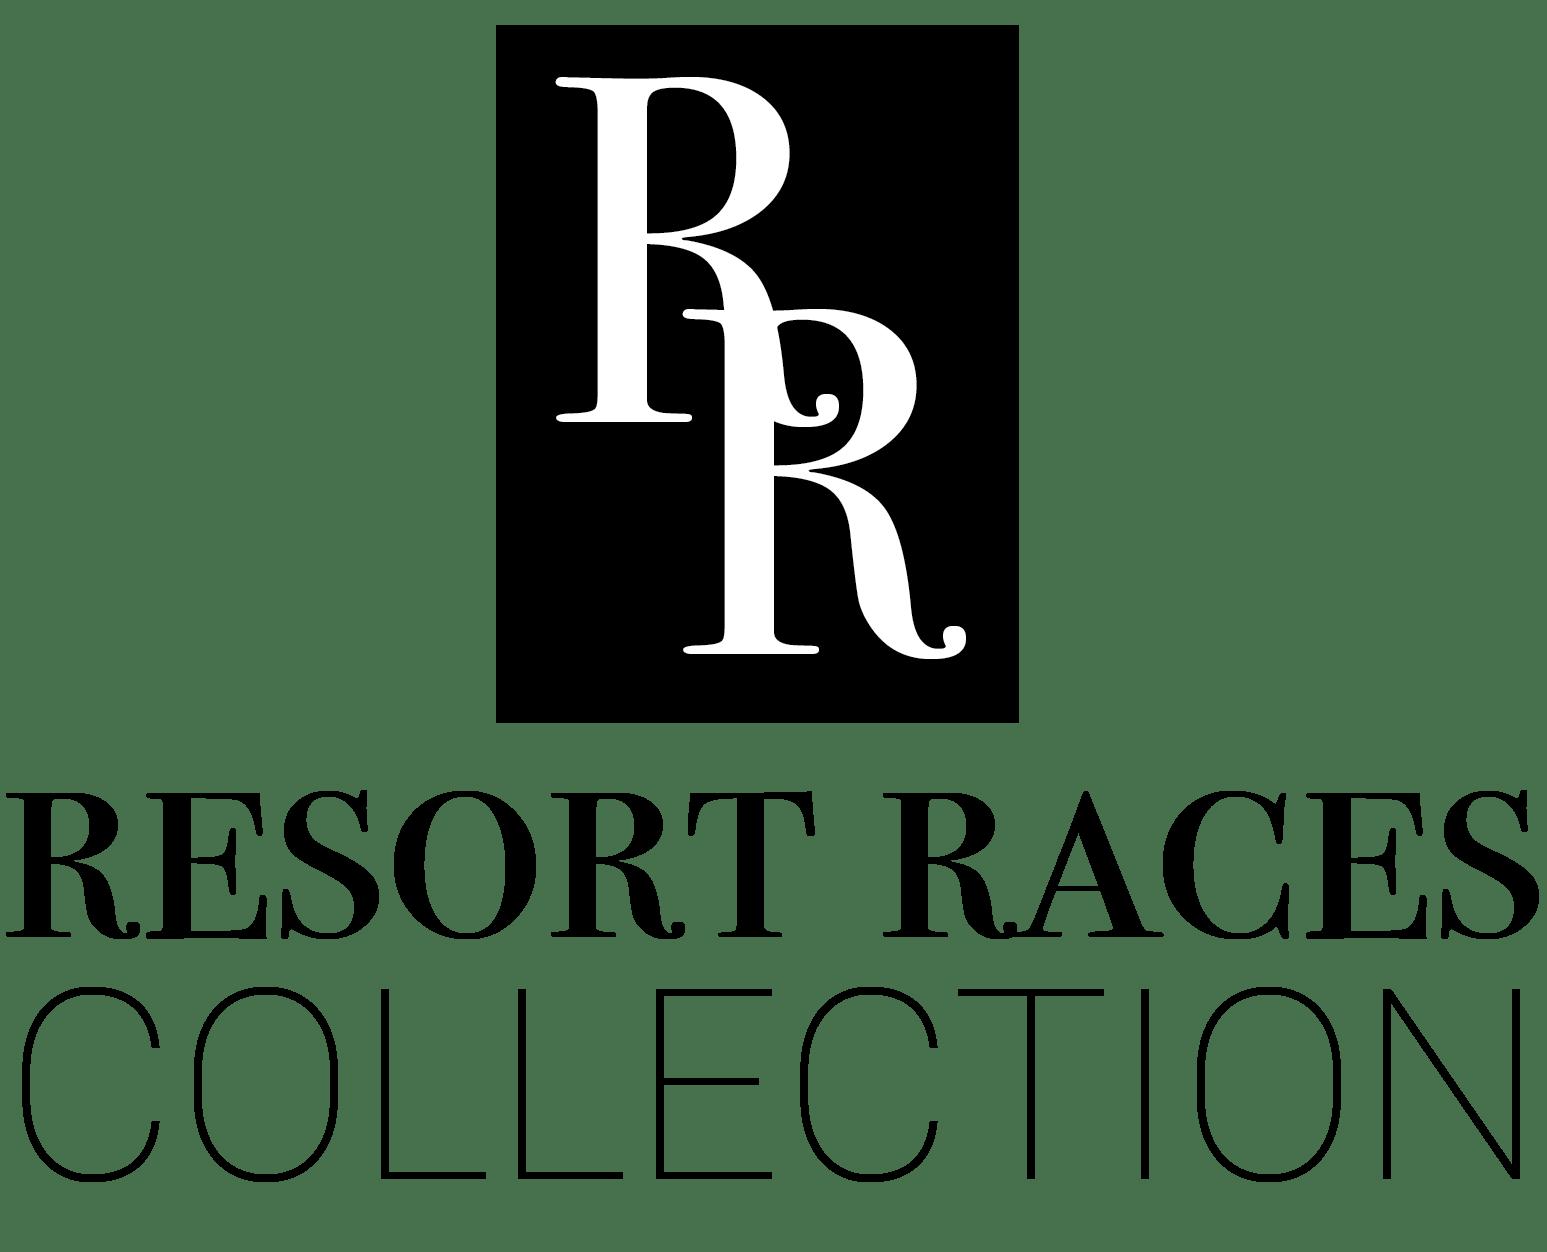 vineyard vines® Joins Resort Races Collection as Series